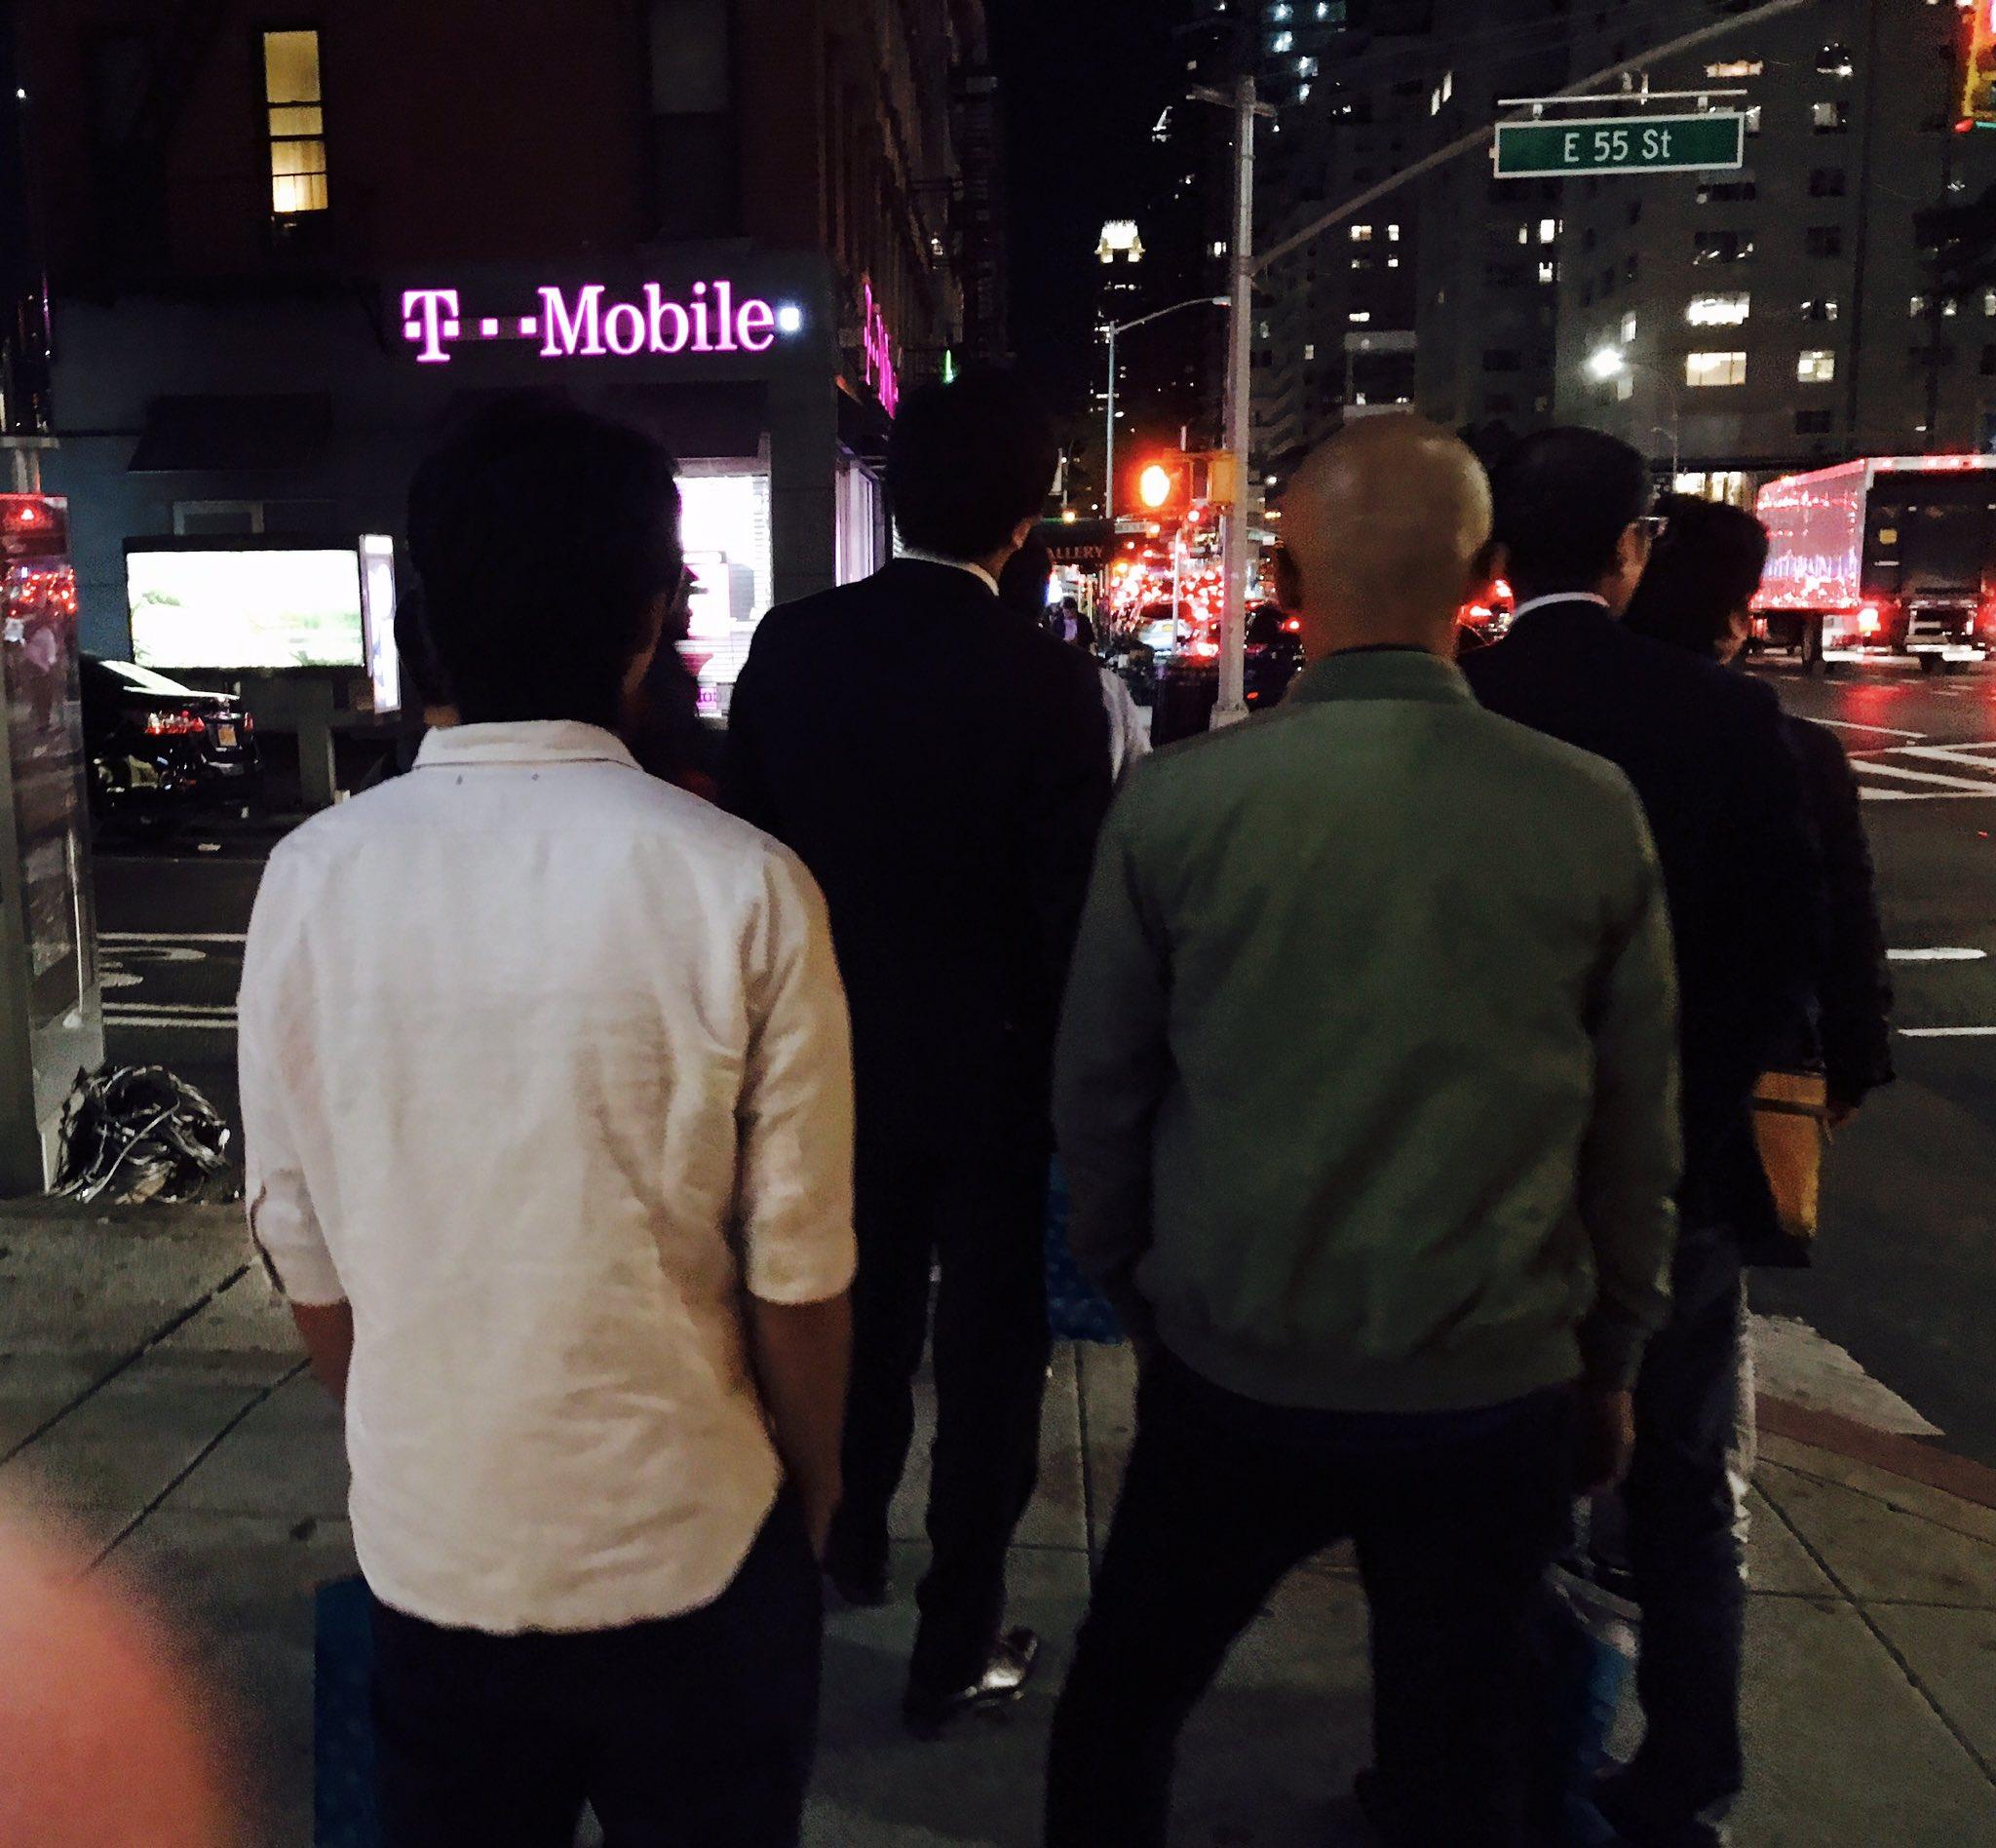 Could of sworn I bumped into the script last night in newyork turns out it wasn't them 😂😂😂 https://t.co/RI5u1kelje